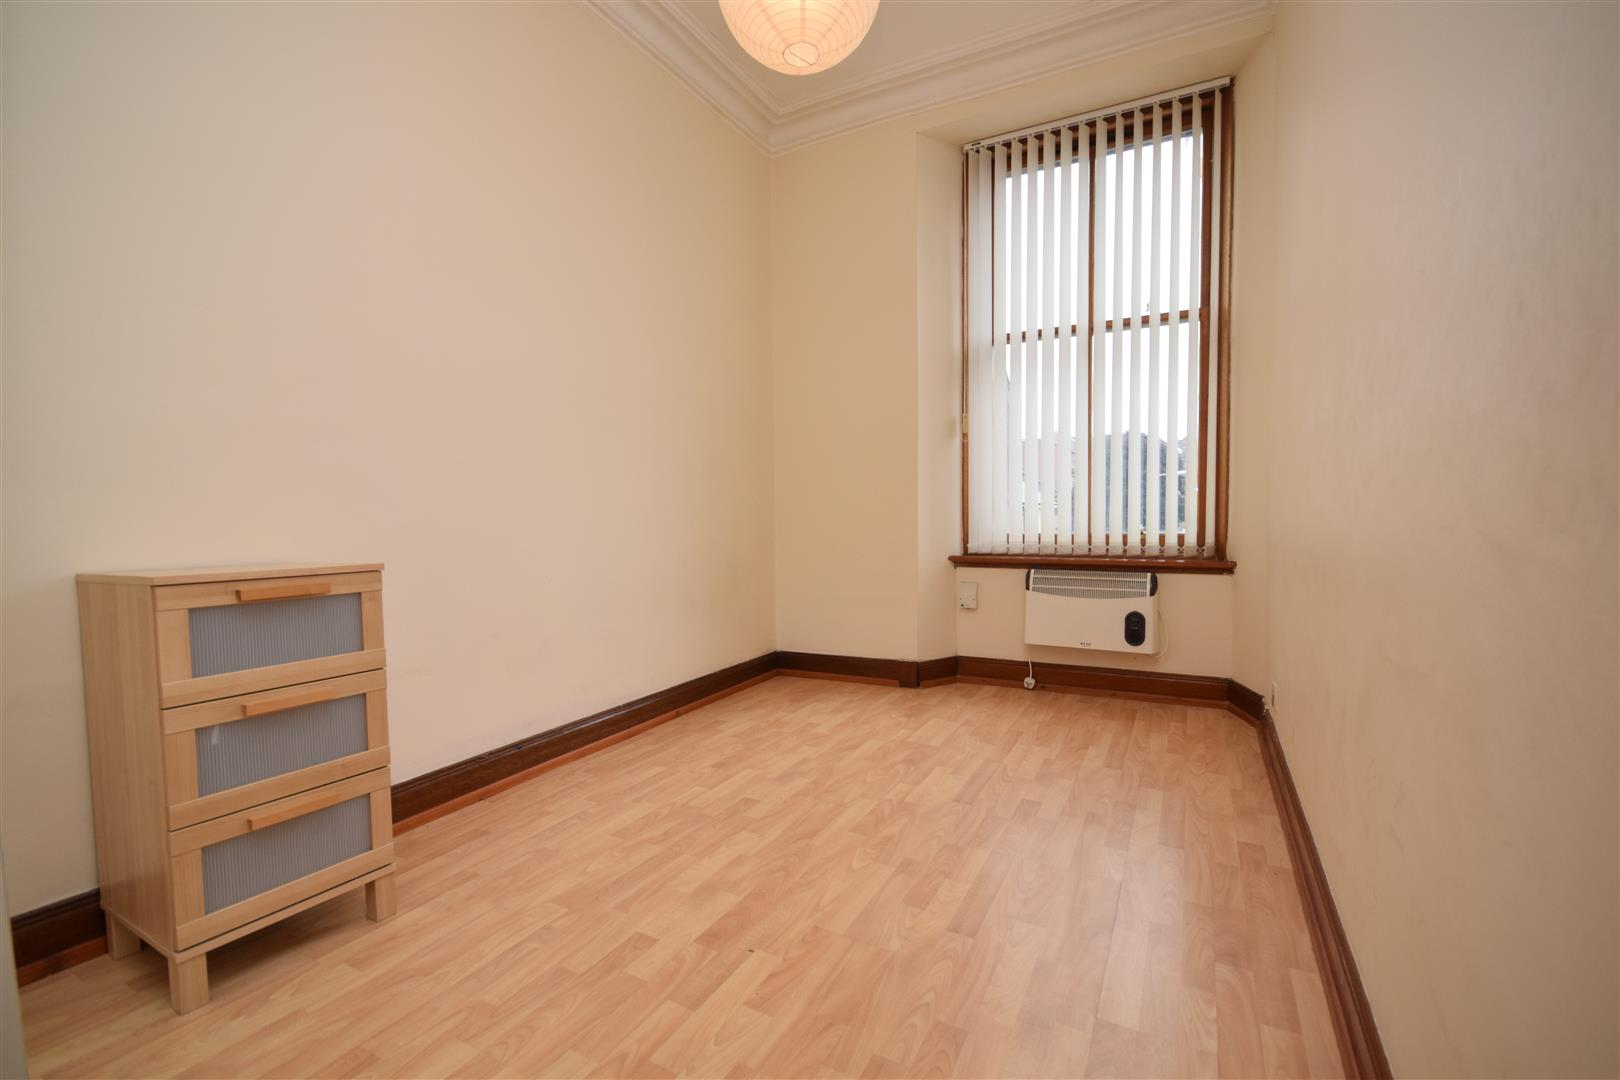 Flat 2, 45, North Methven Street, Perth, Perthshire, PH1 5PX, UK